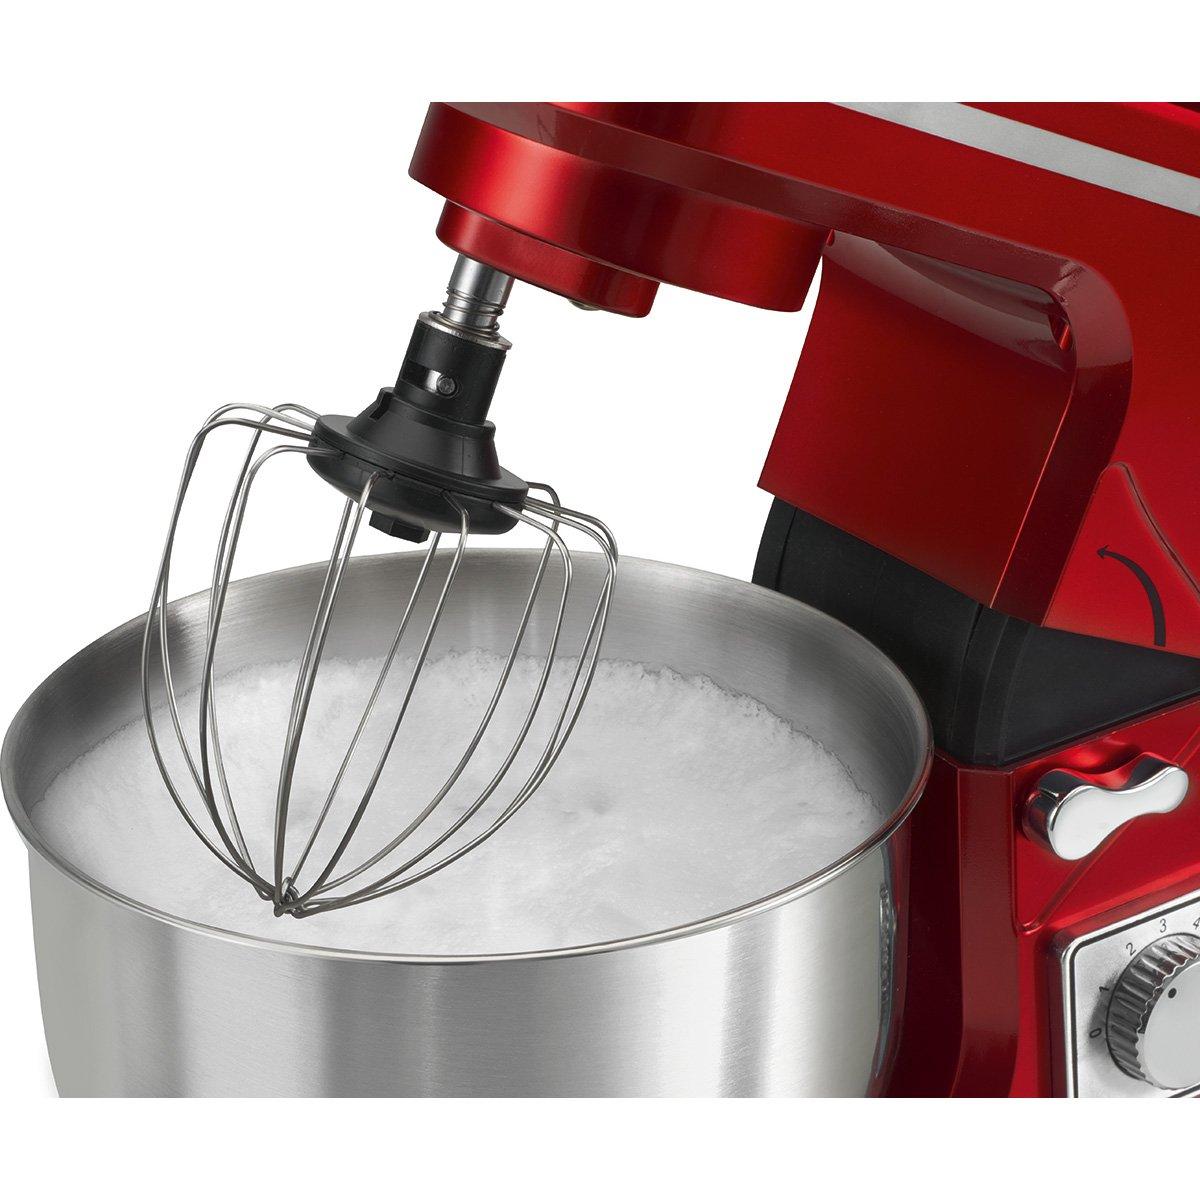 Bomann KM 1393 CB - Batidora amasadora repostería Capacidad de 5 litros, 7 velocidades, 1000 W Color roja + báscula Cocina: Amazon.es: Hogar